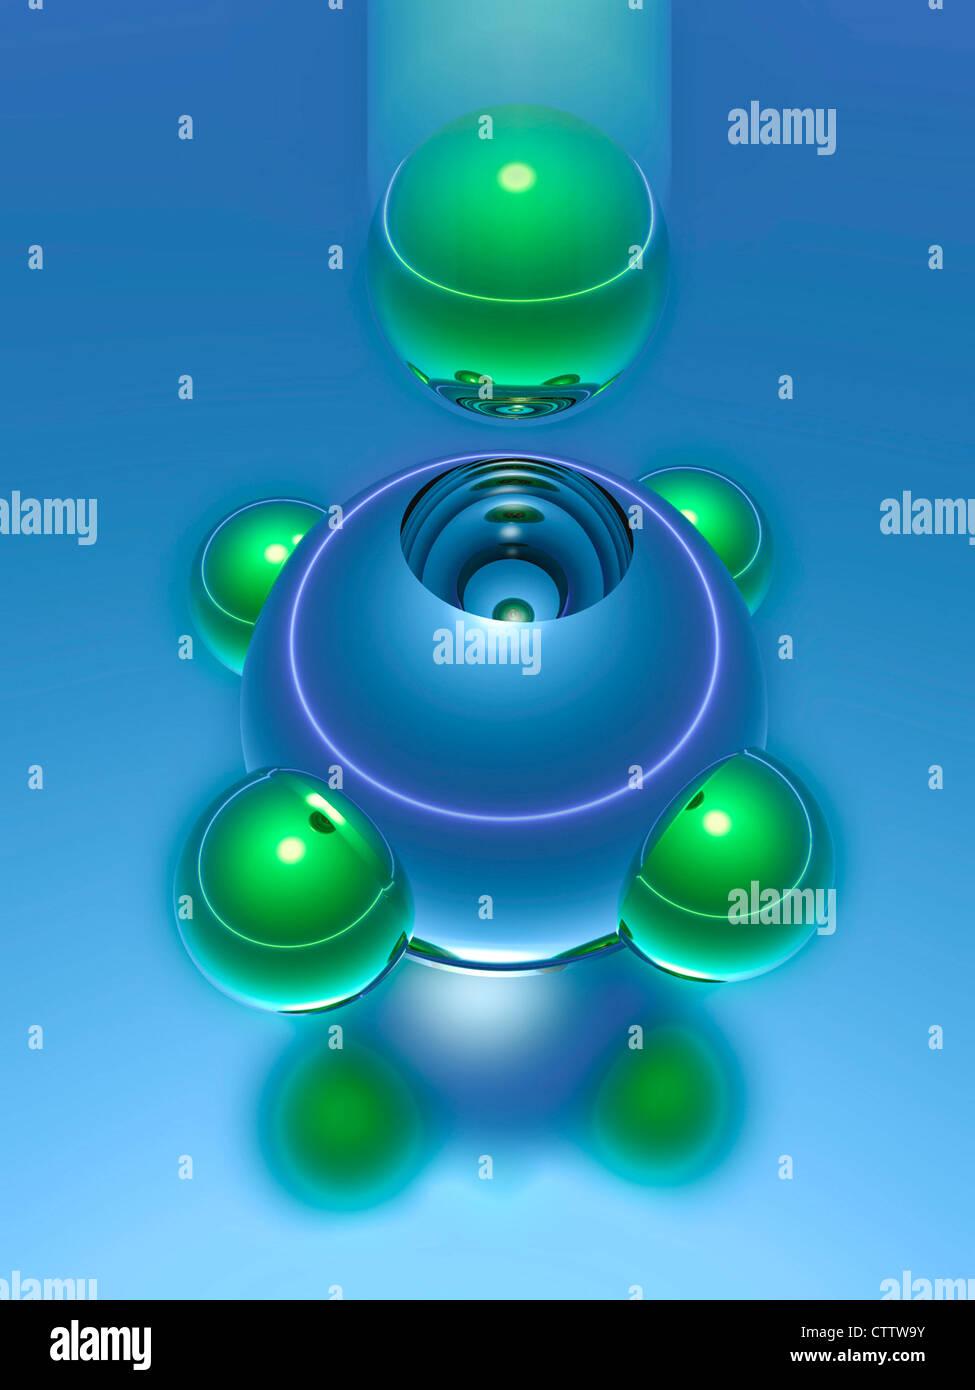 Modul System - modular ineinanderpassende Kugeln - Stock Image